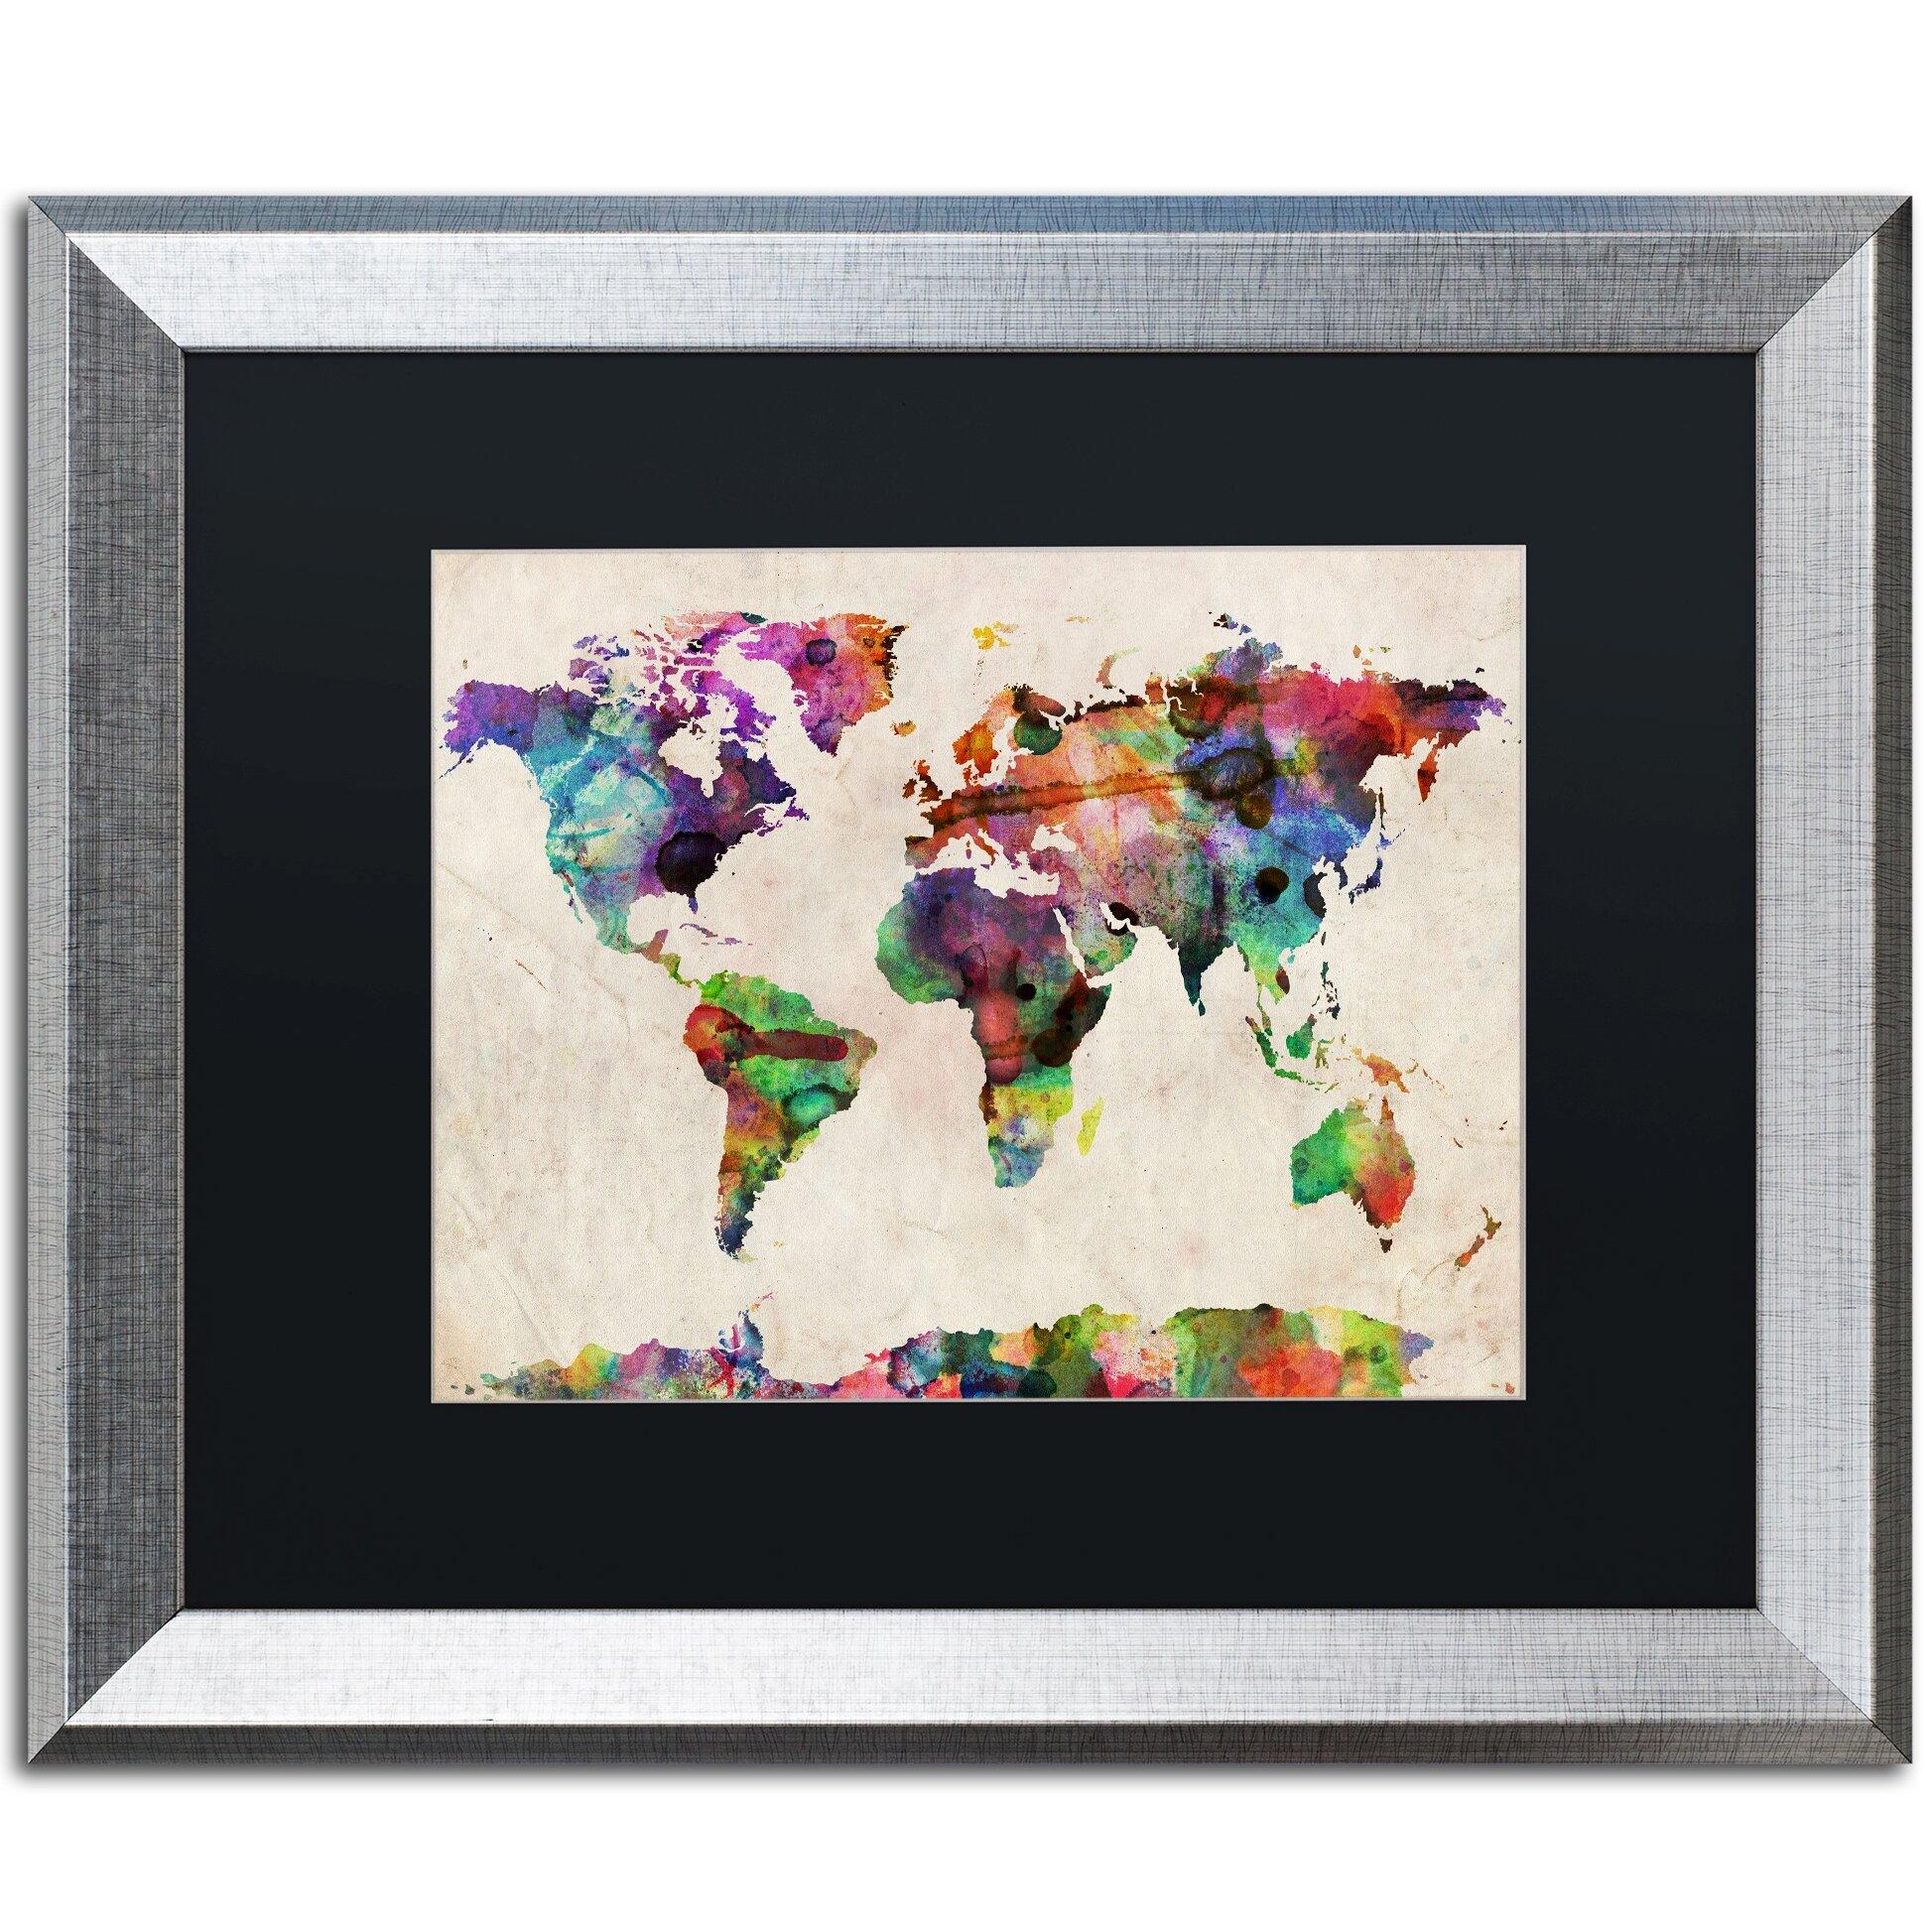 Urban Watercolor World Map.Trademark Art Urban Watercolor World Map By Michael Tompsett Framed